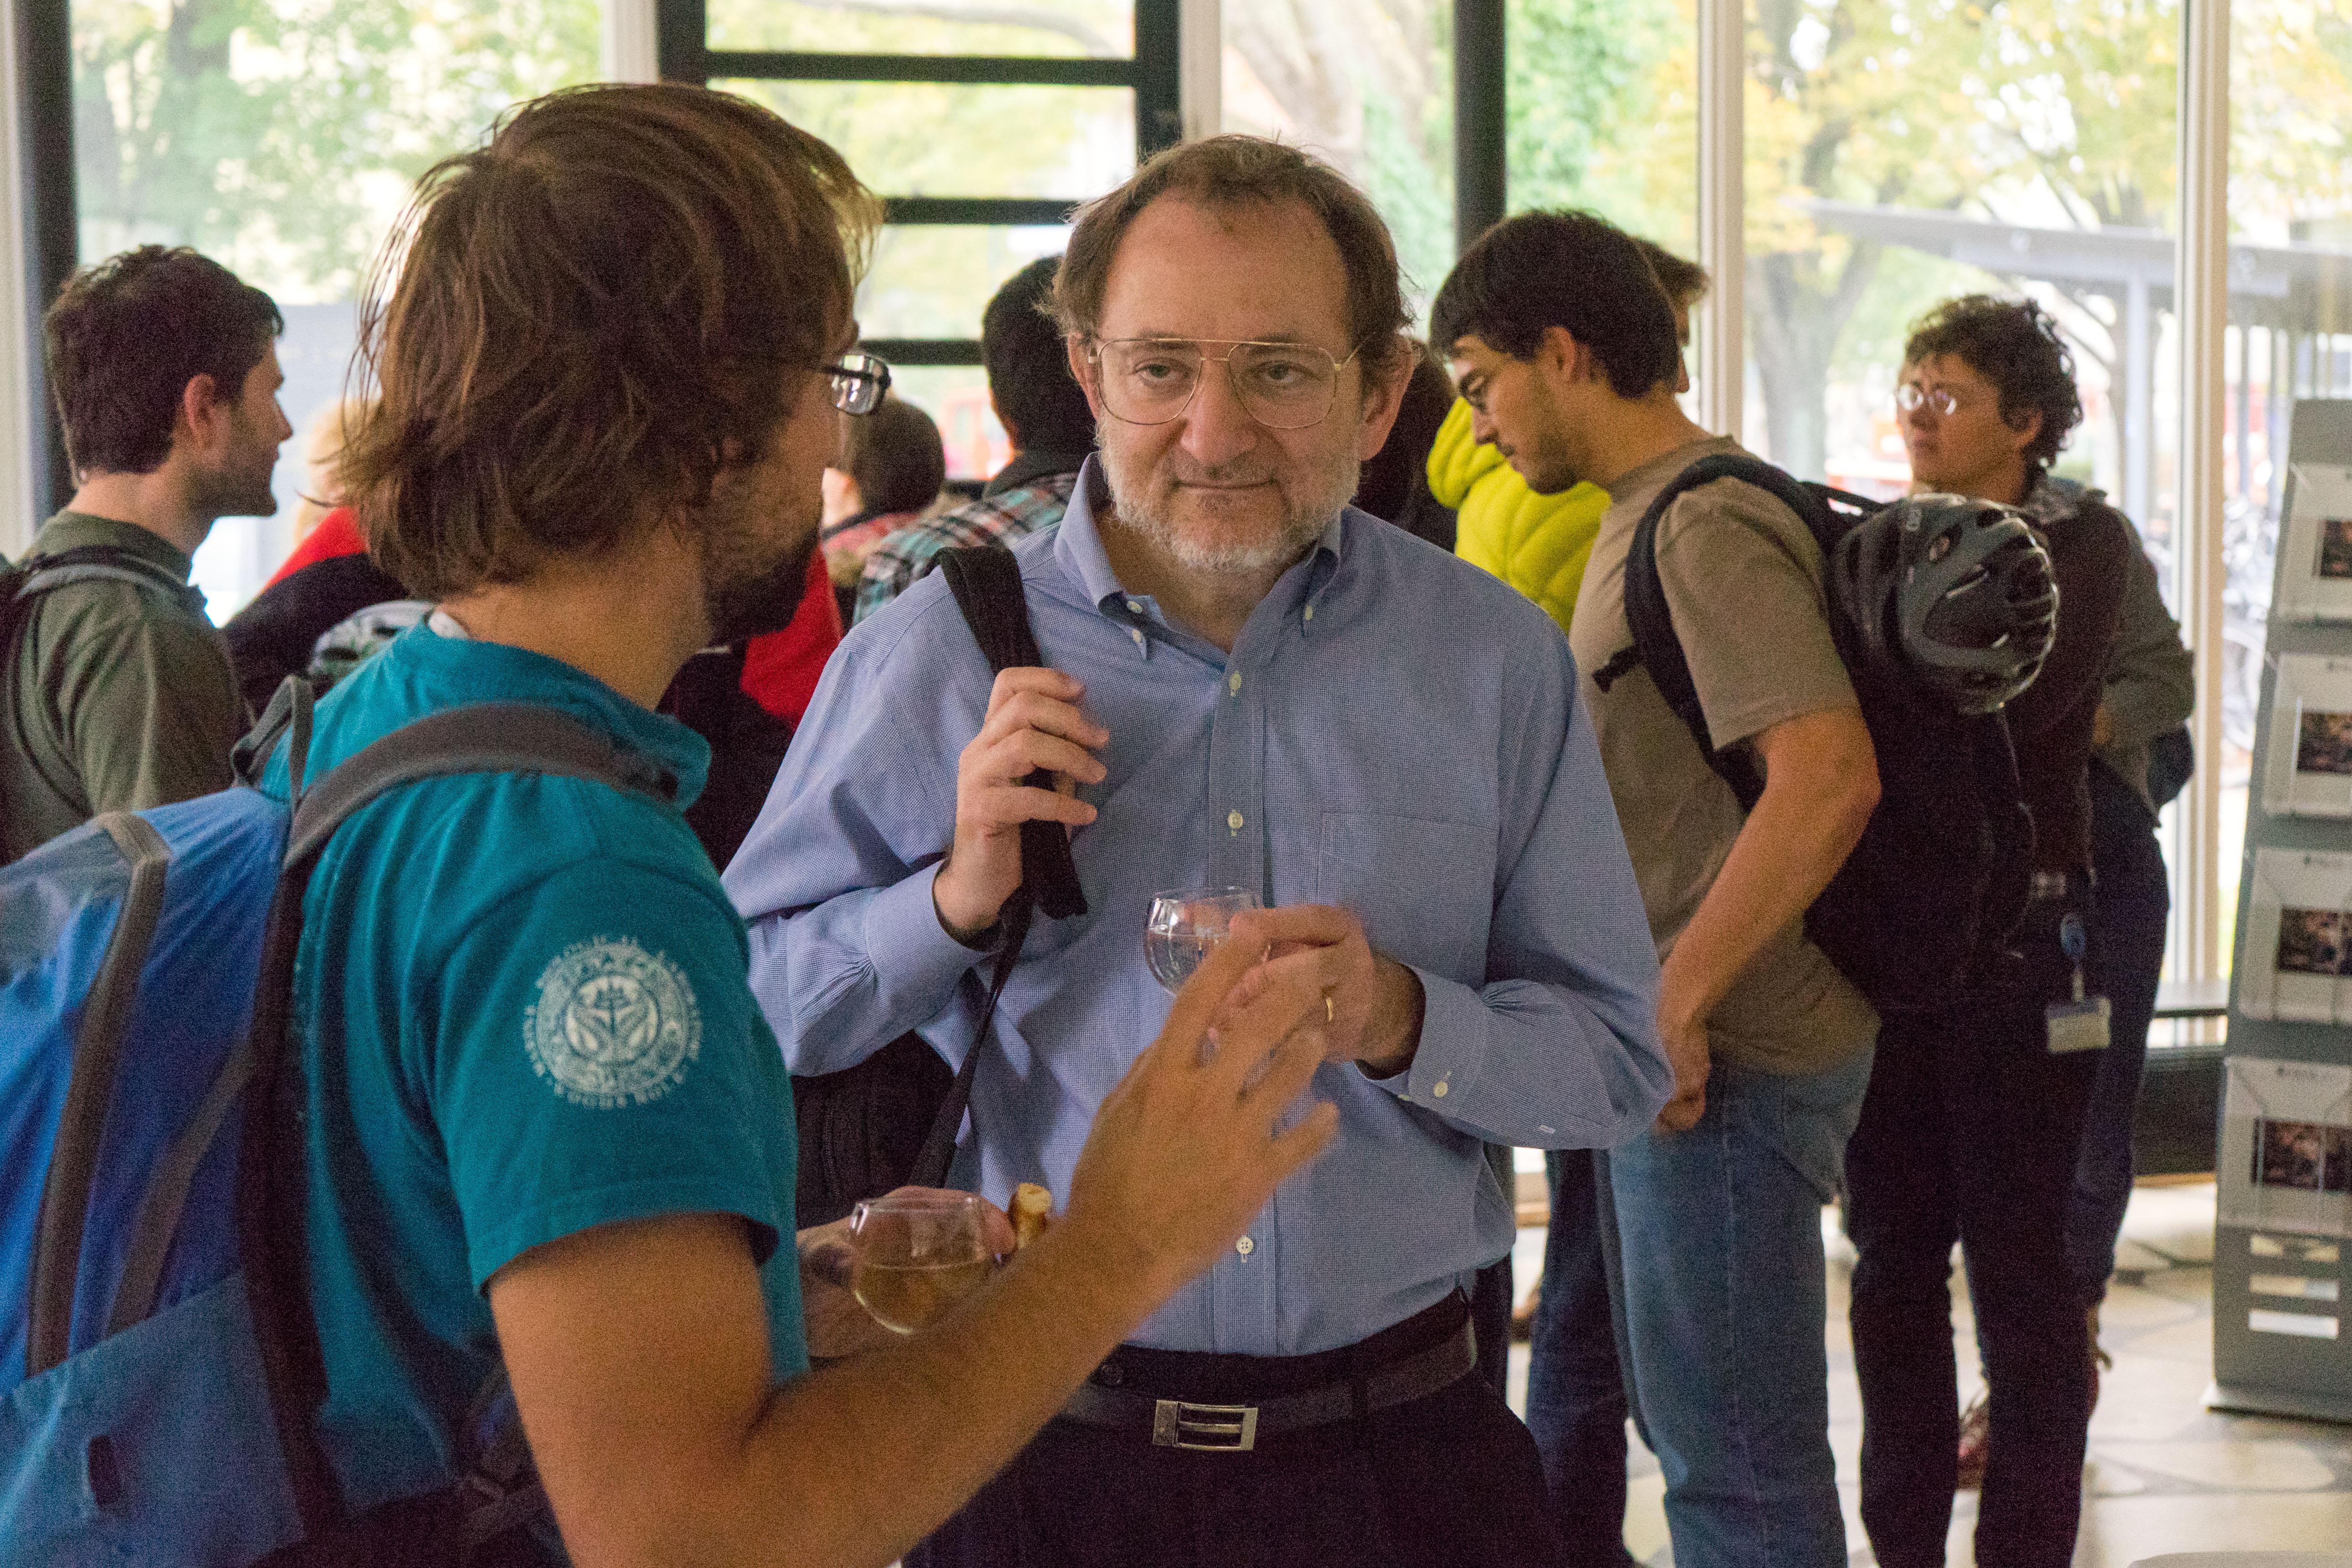 Hermann Staudinger Lecture - Andrew Fire 3